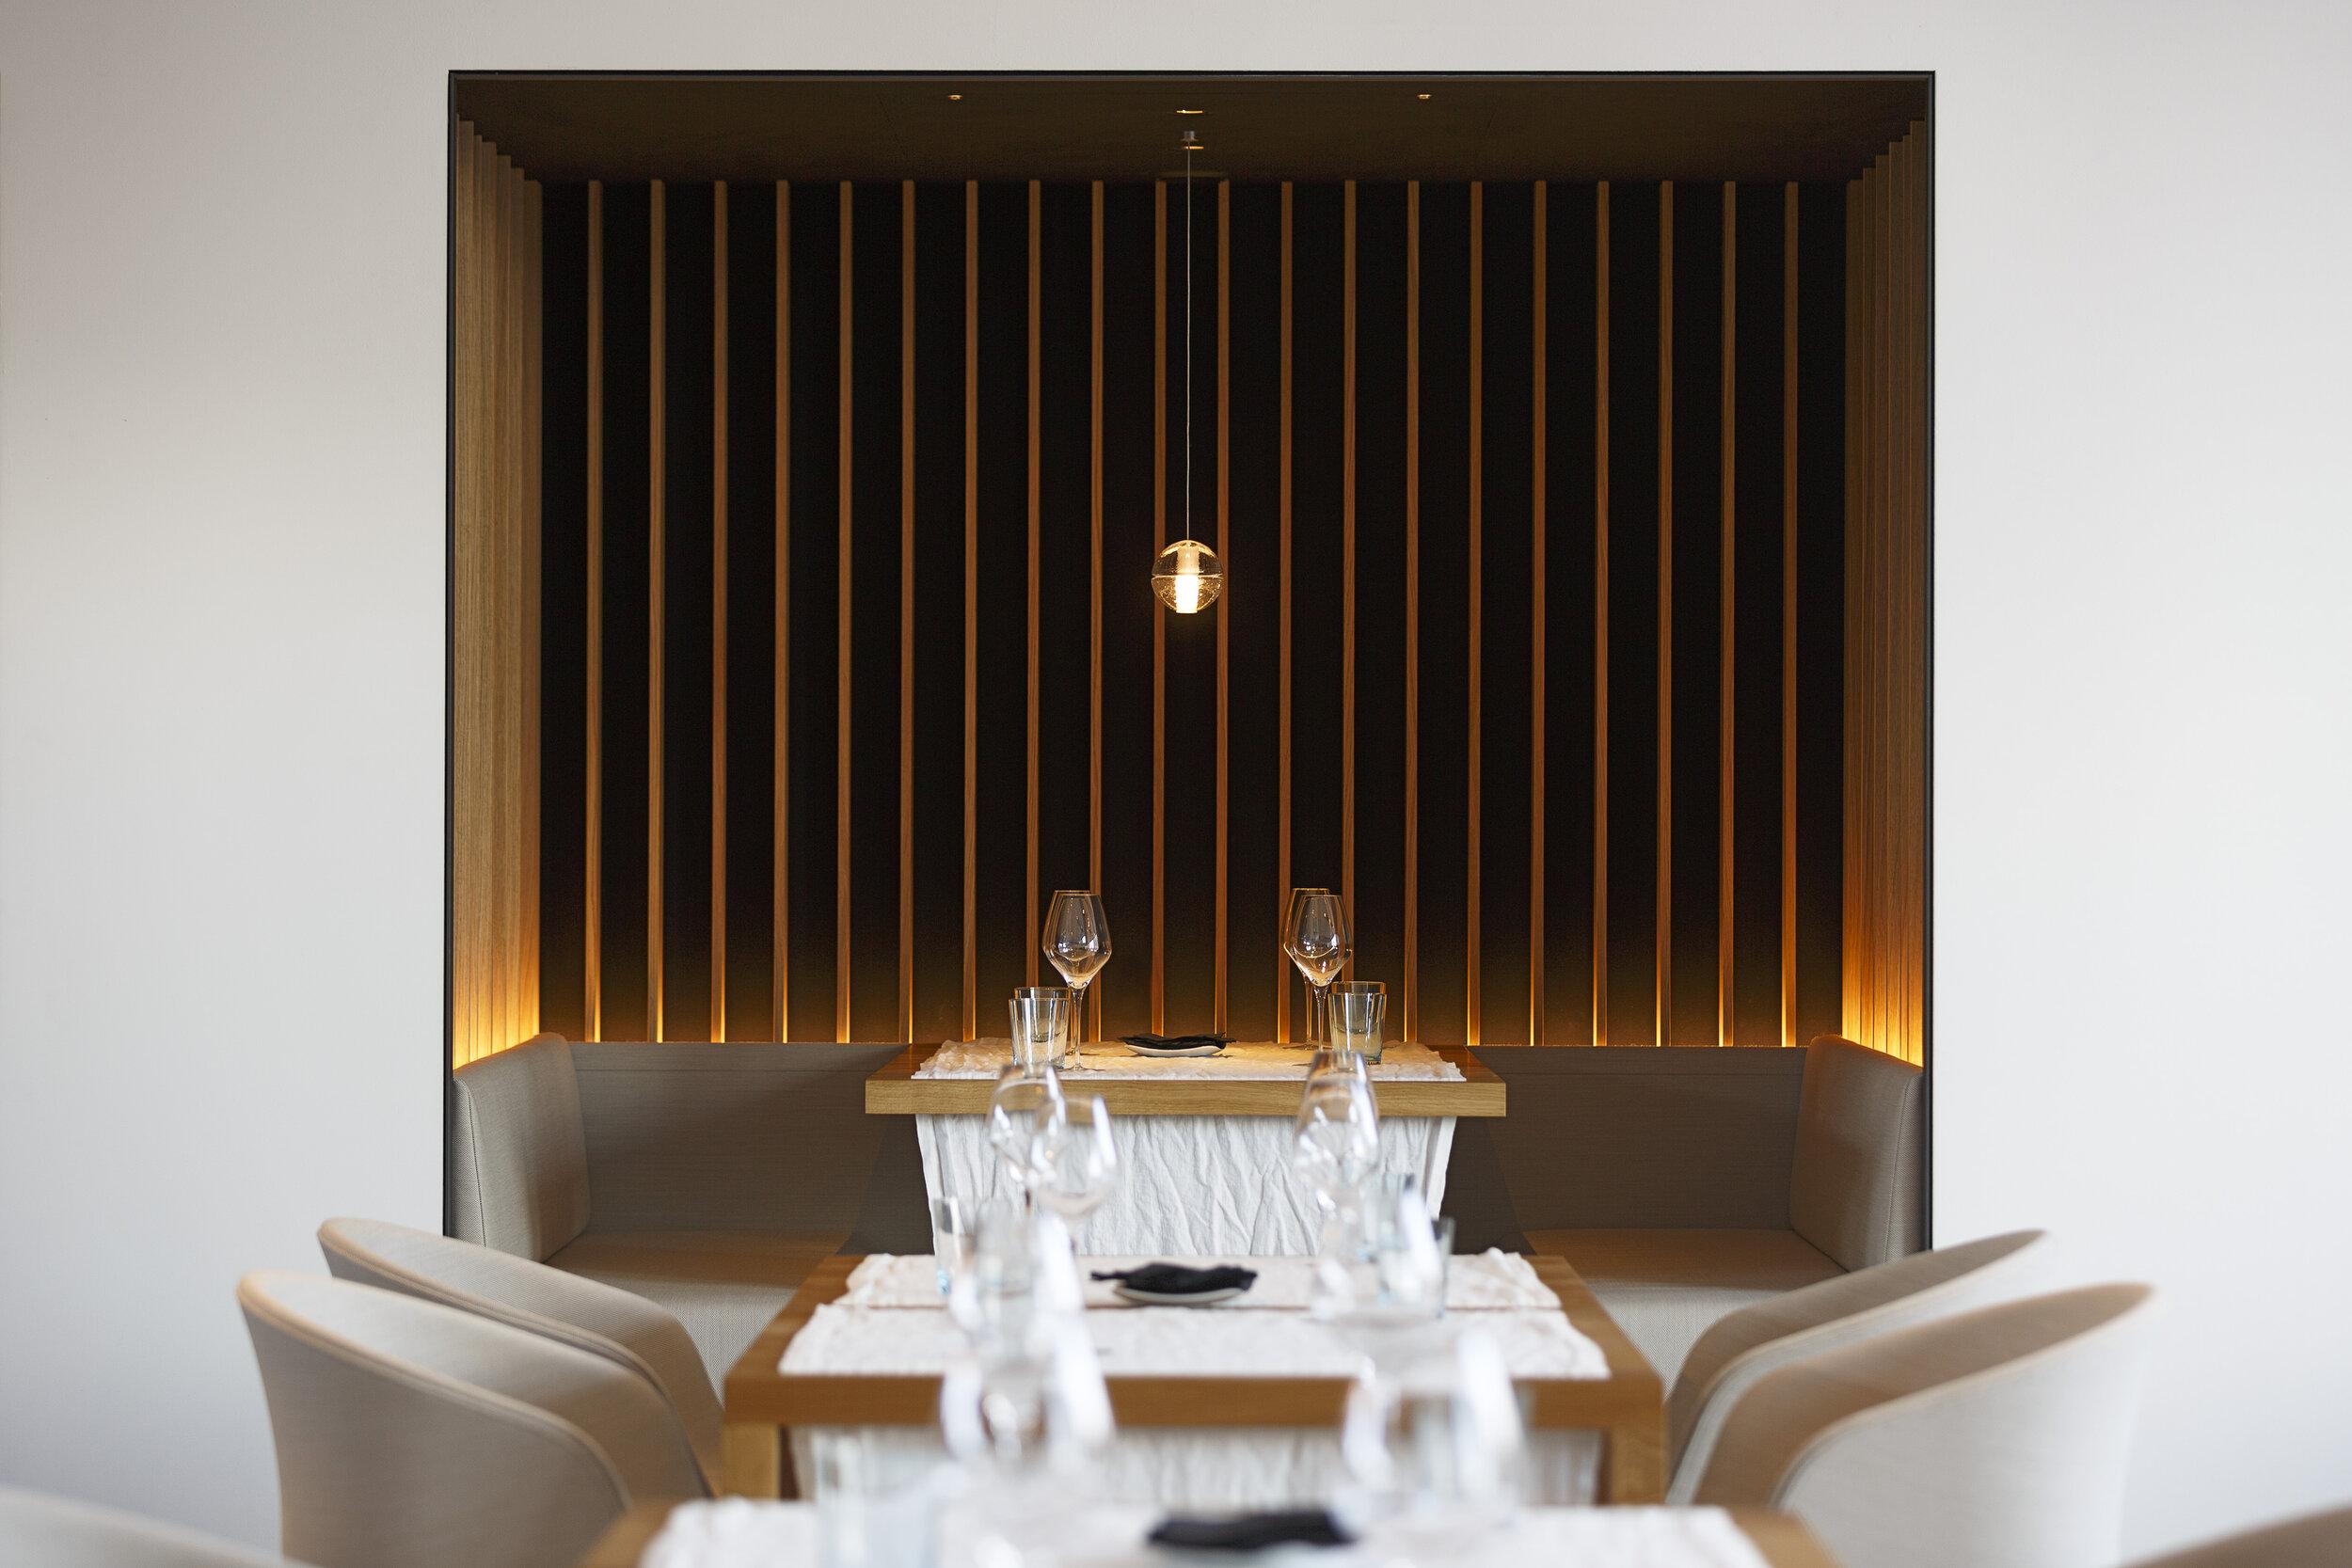 01_Restaurant Storstad_Sitzloge im Hauptgastraum_Foto Florian Hammerich.jpg